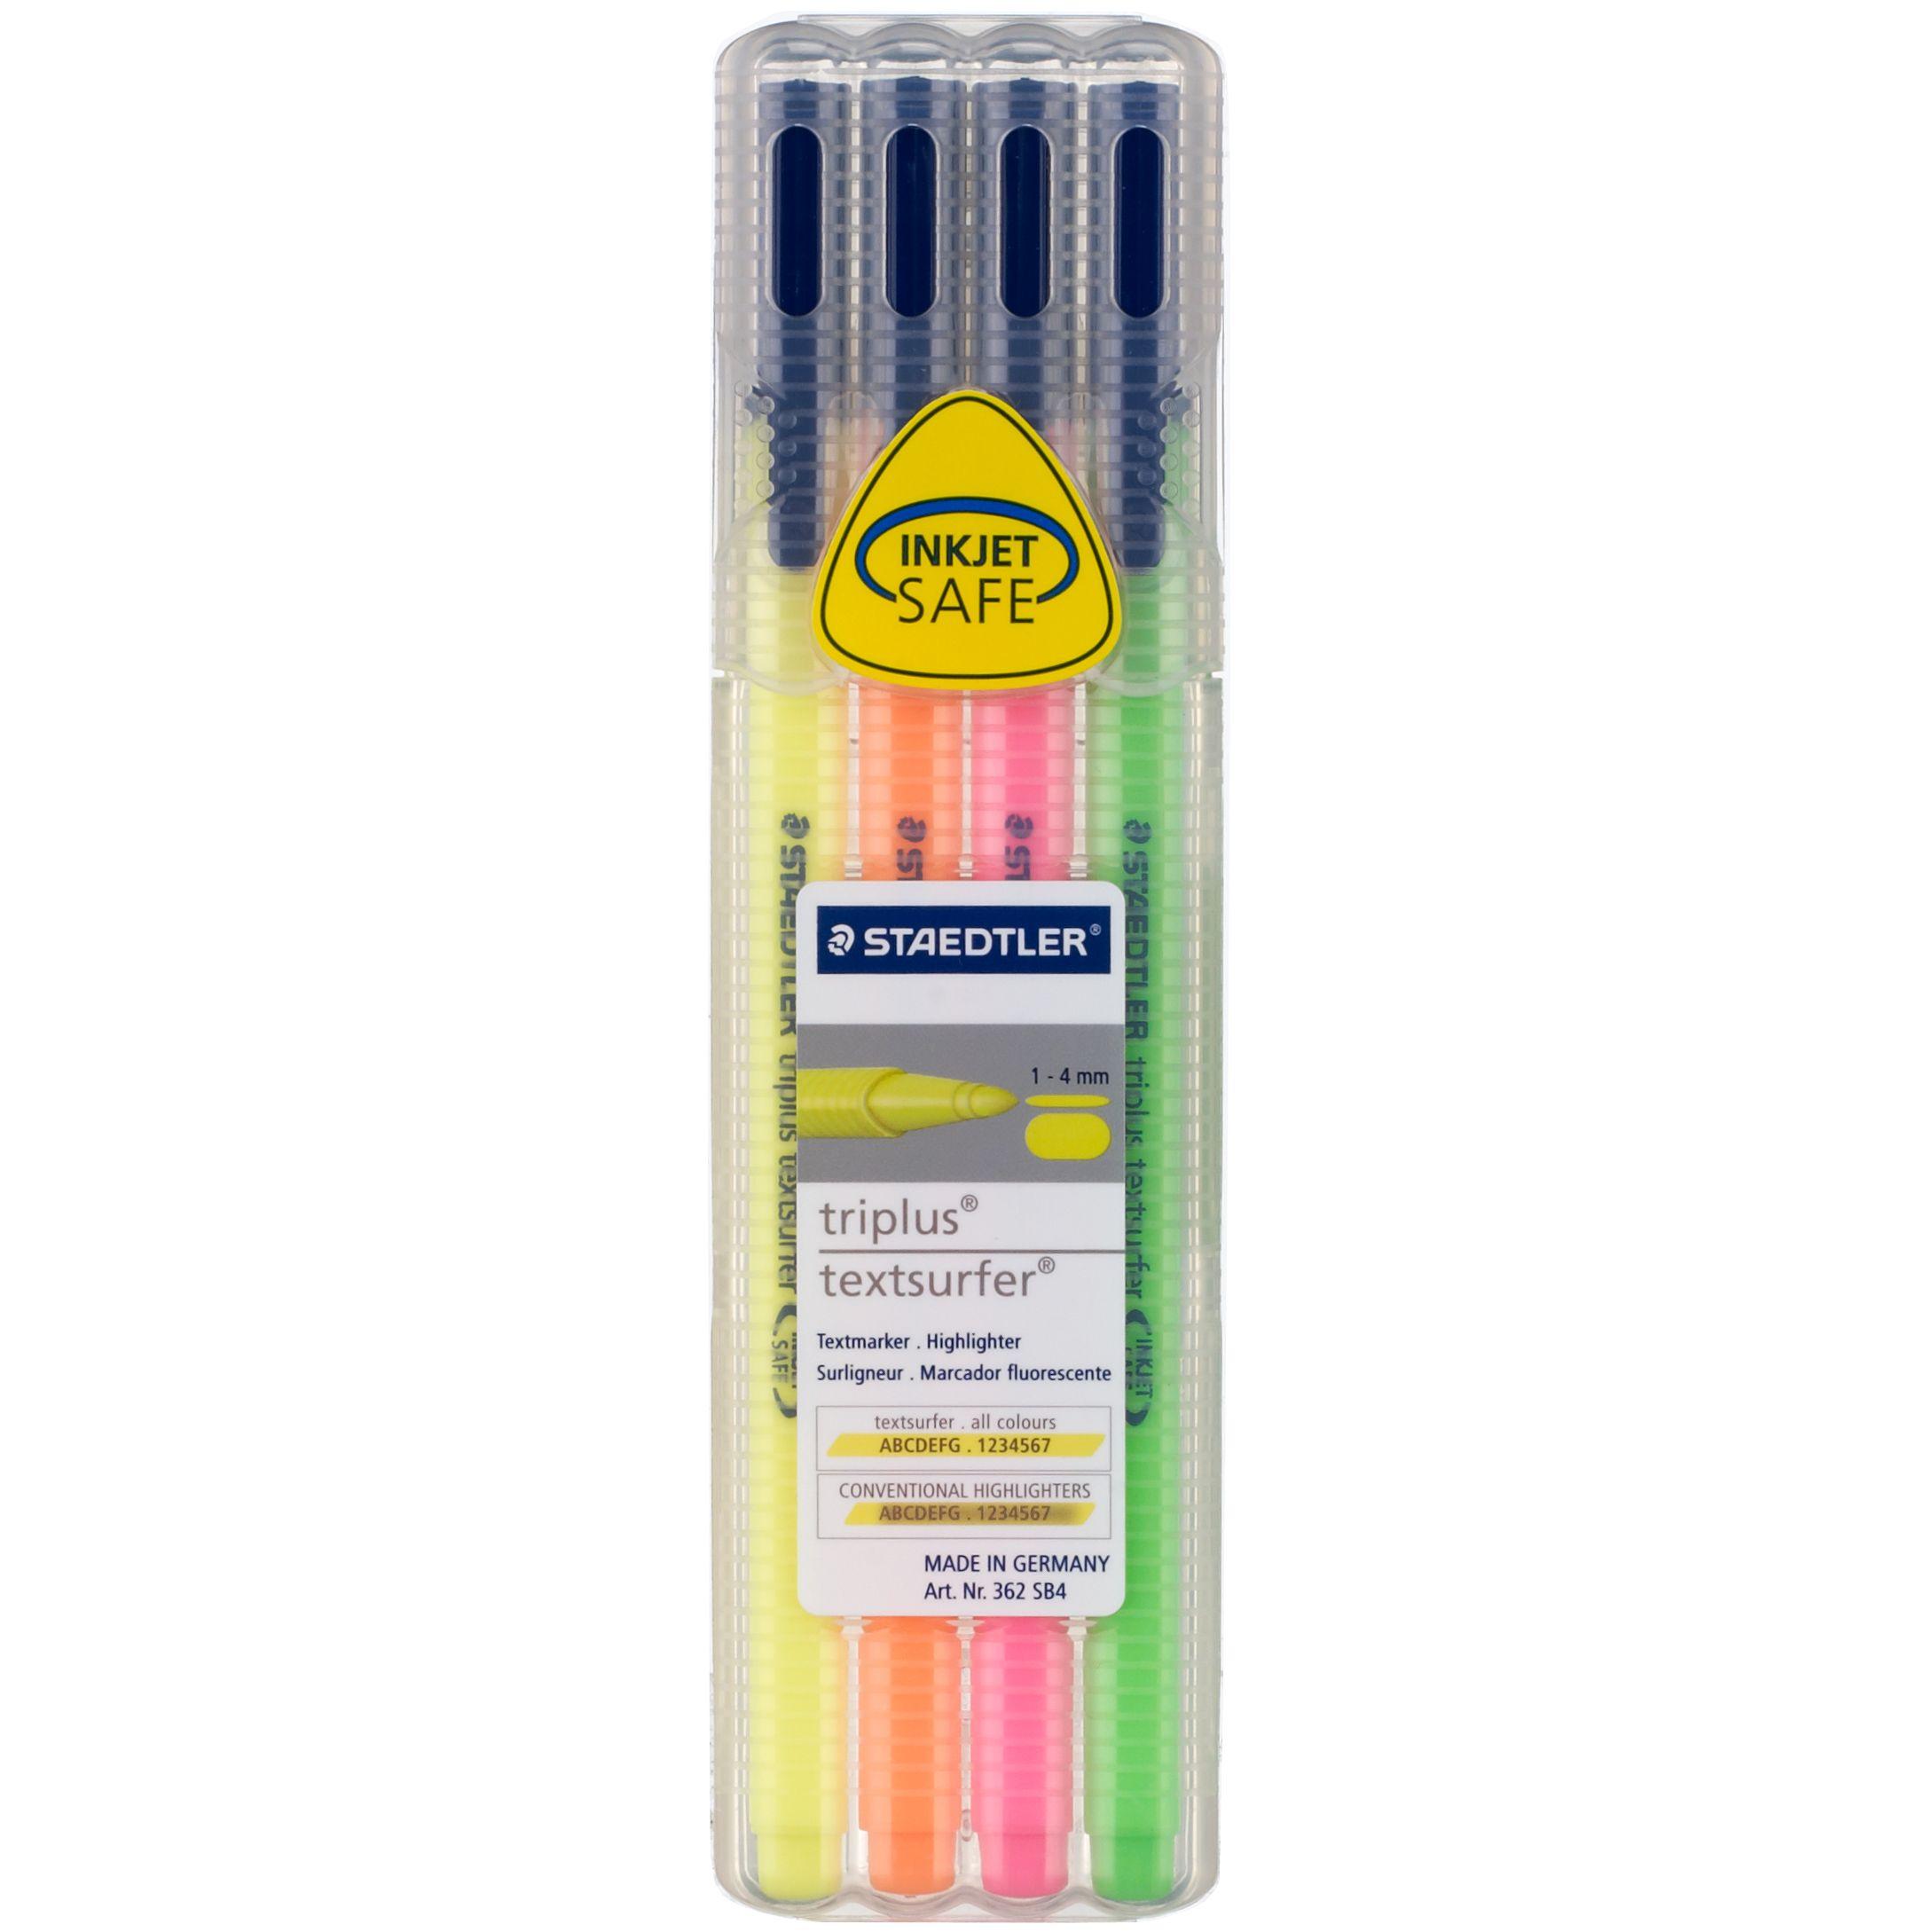 Staedtler Staedtler Triplus Highlighter Pens, Pack of 4